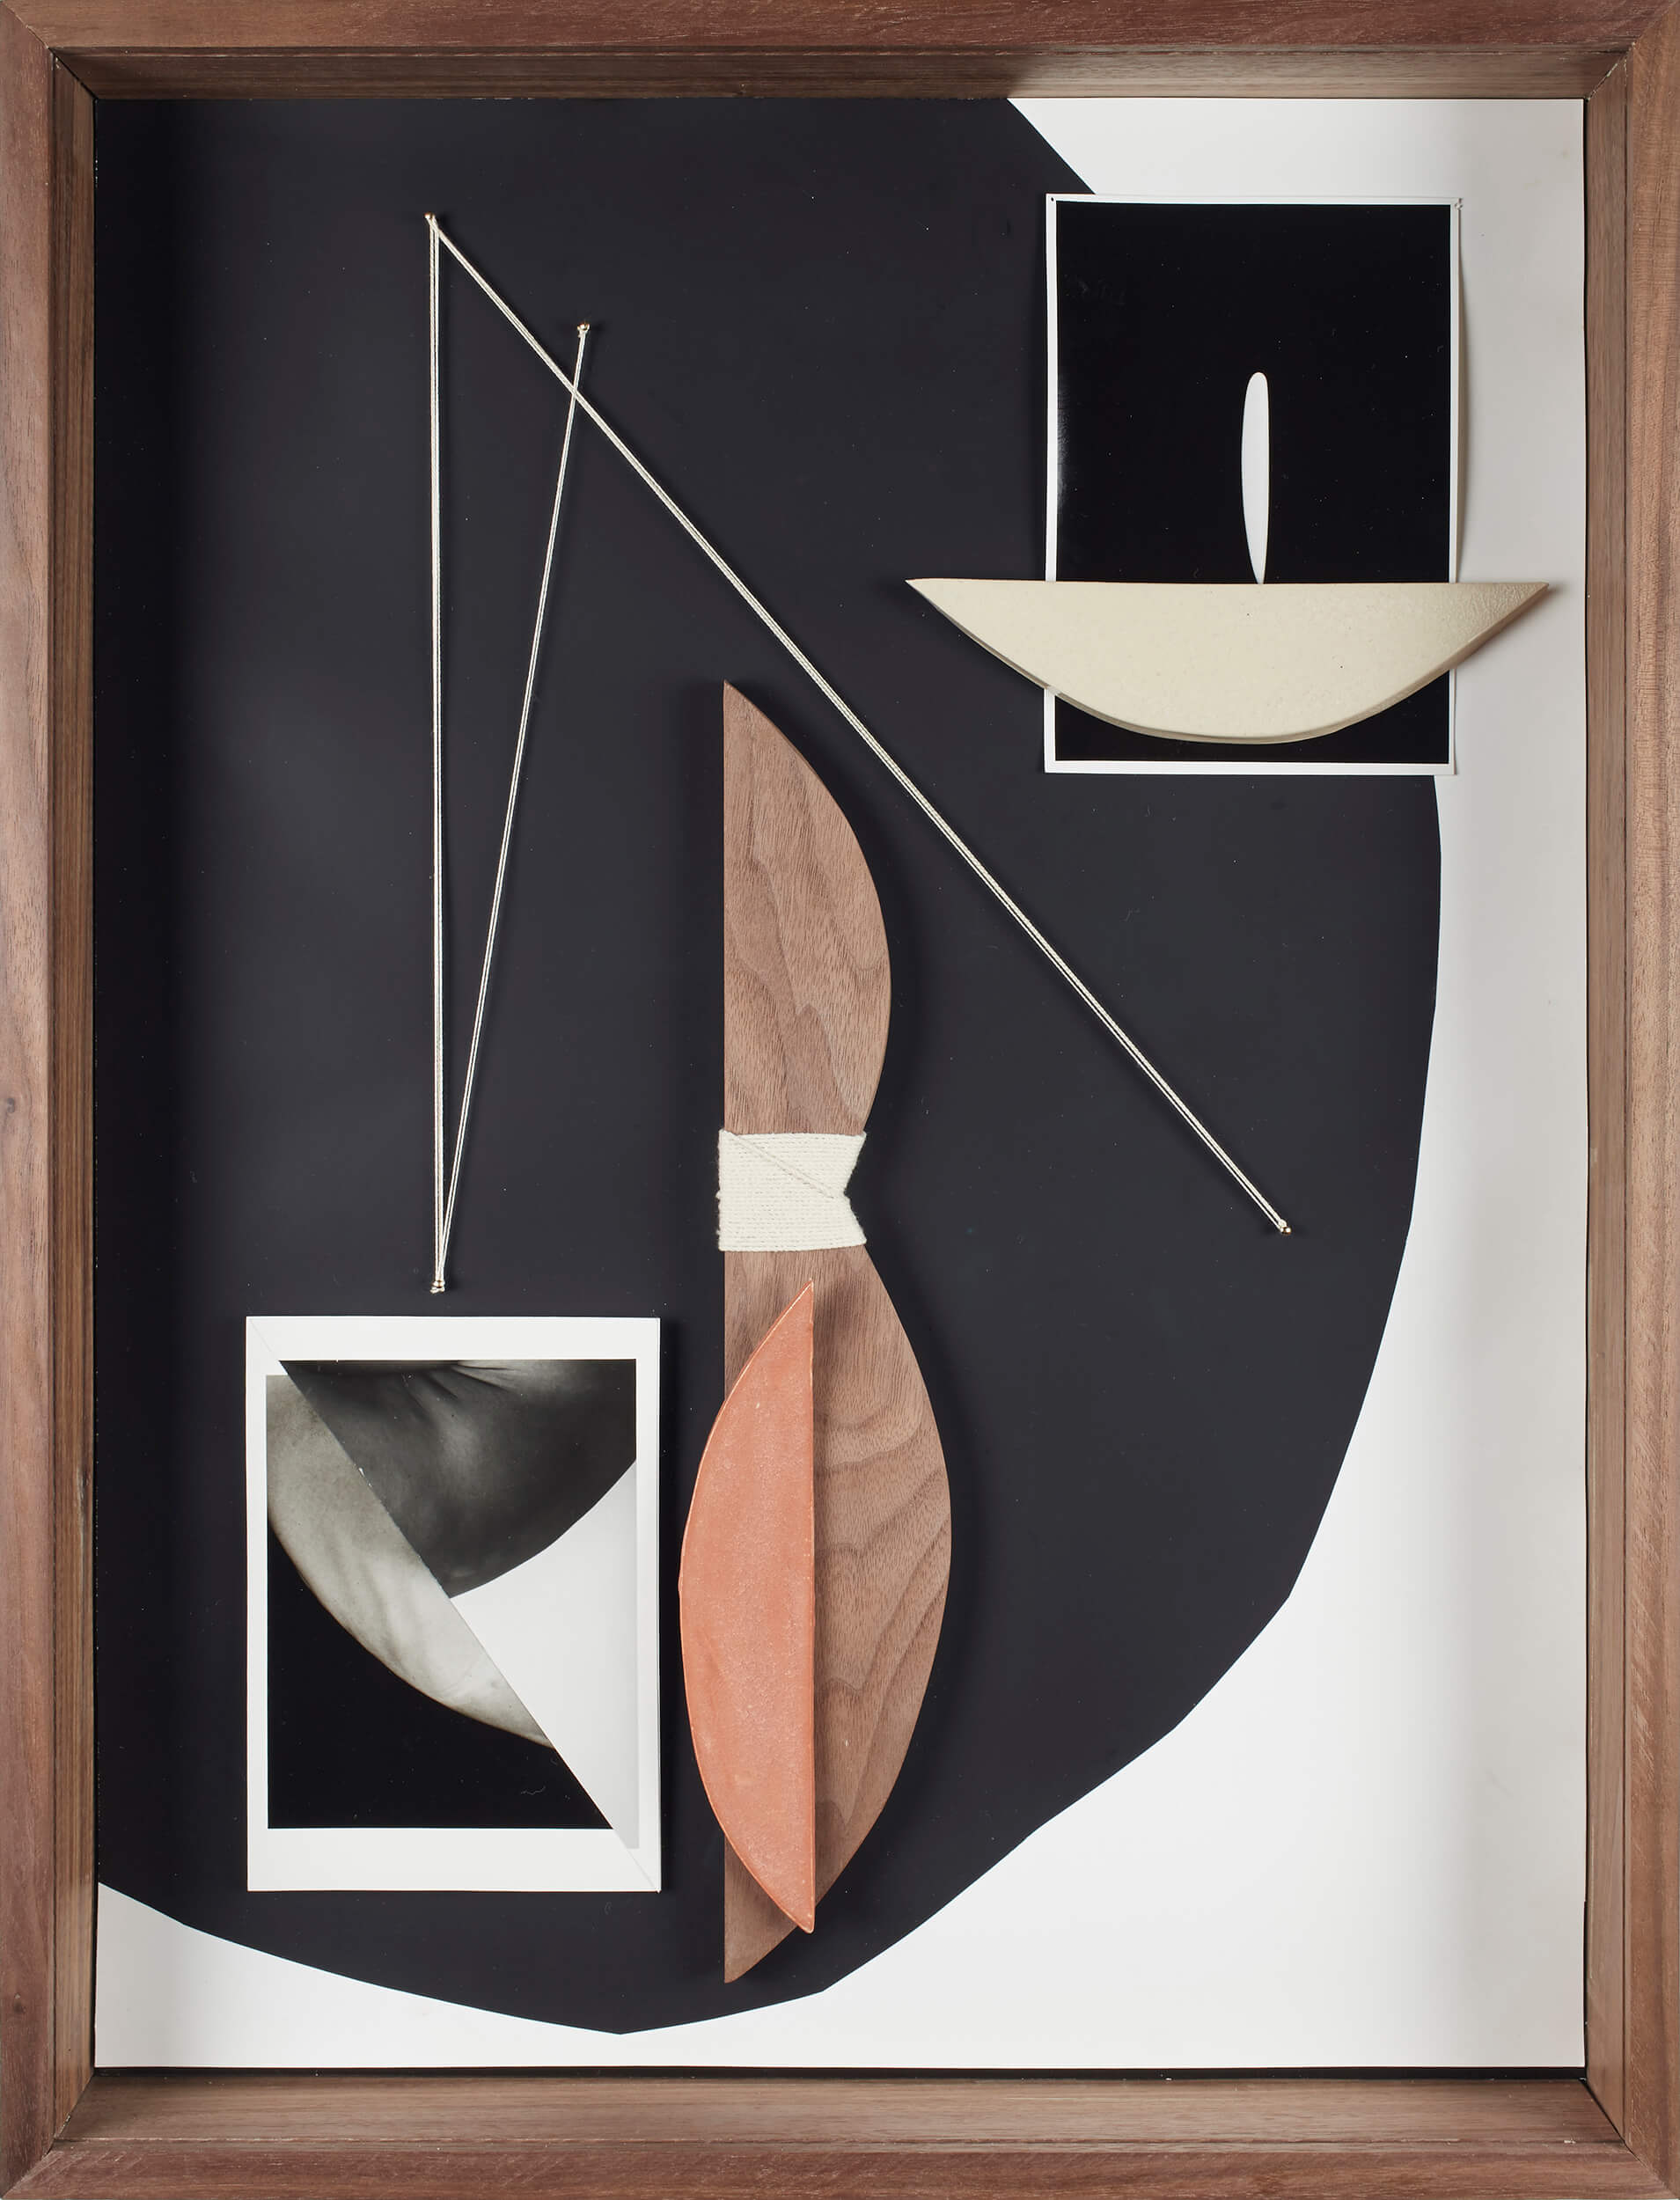 Sheree Hovsepian Grounding, 2019 silver gelatin prints, photograms, ceramic, wood, string, nails, artist's frame (walnut, optium museum acrylic) 25 x 19 1/4 x 4 in. (63.5 x 48.9 x 10.2 cm.)